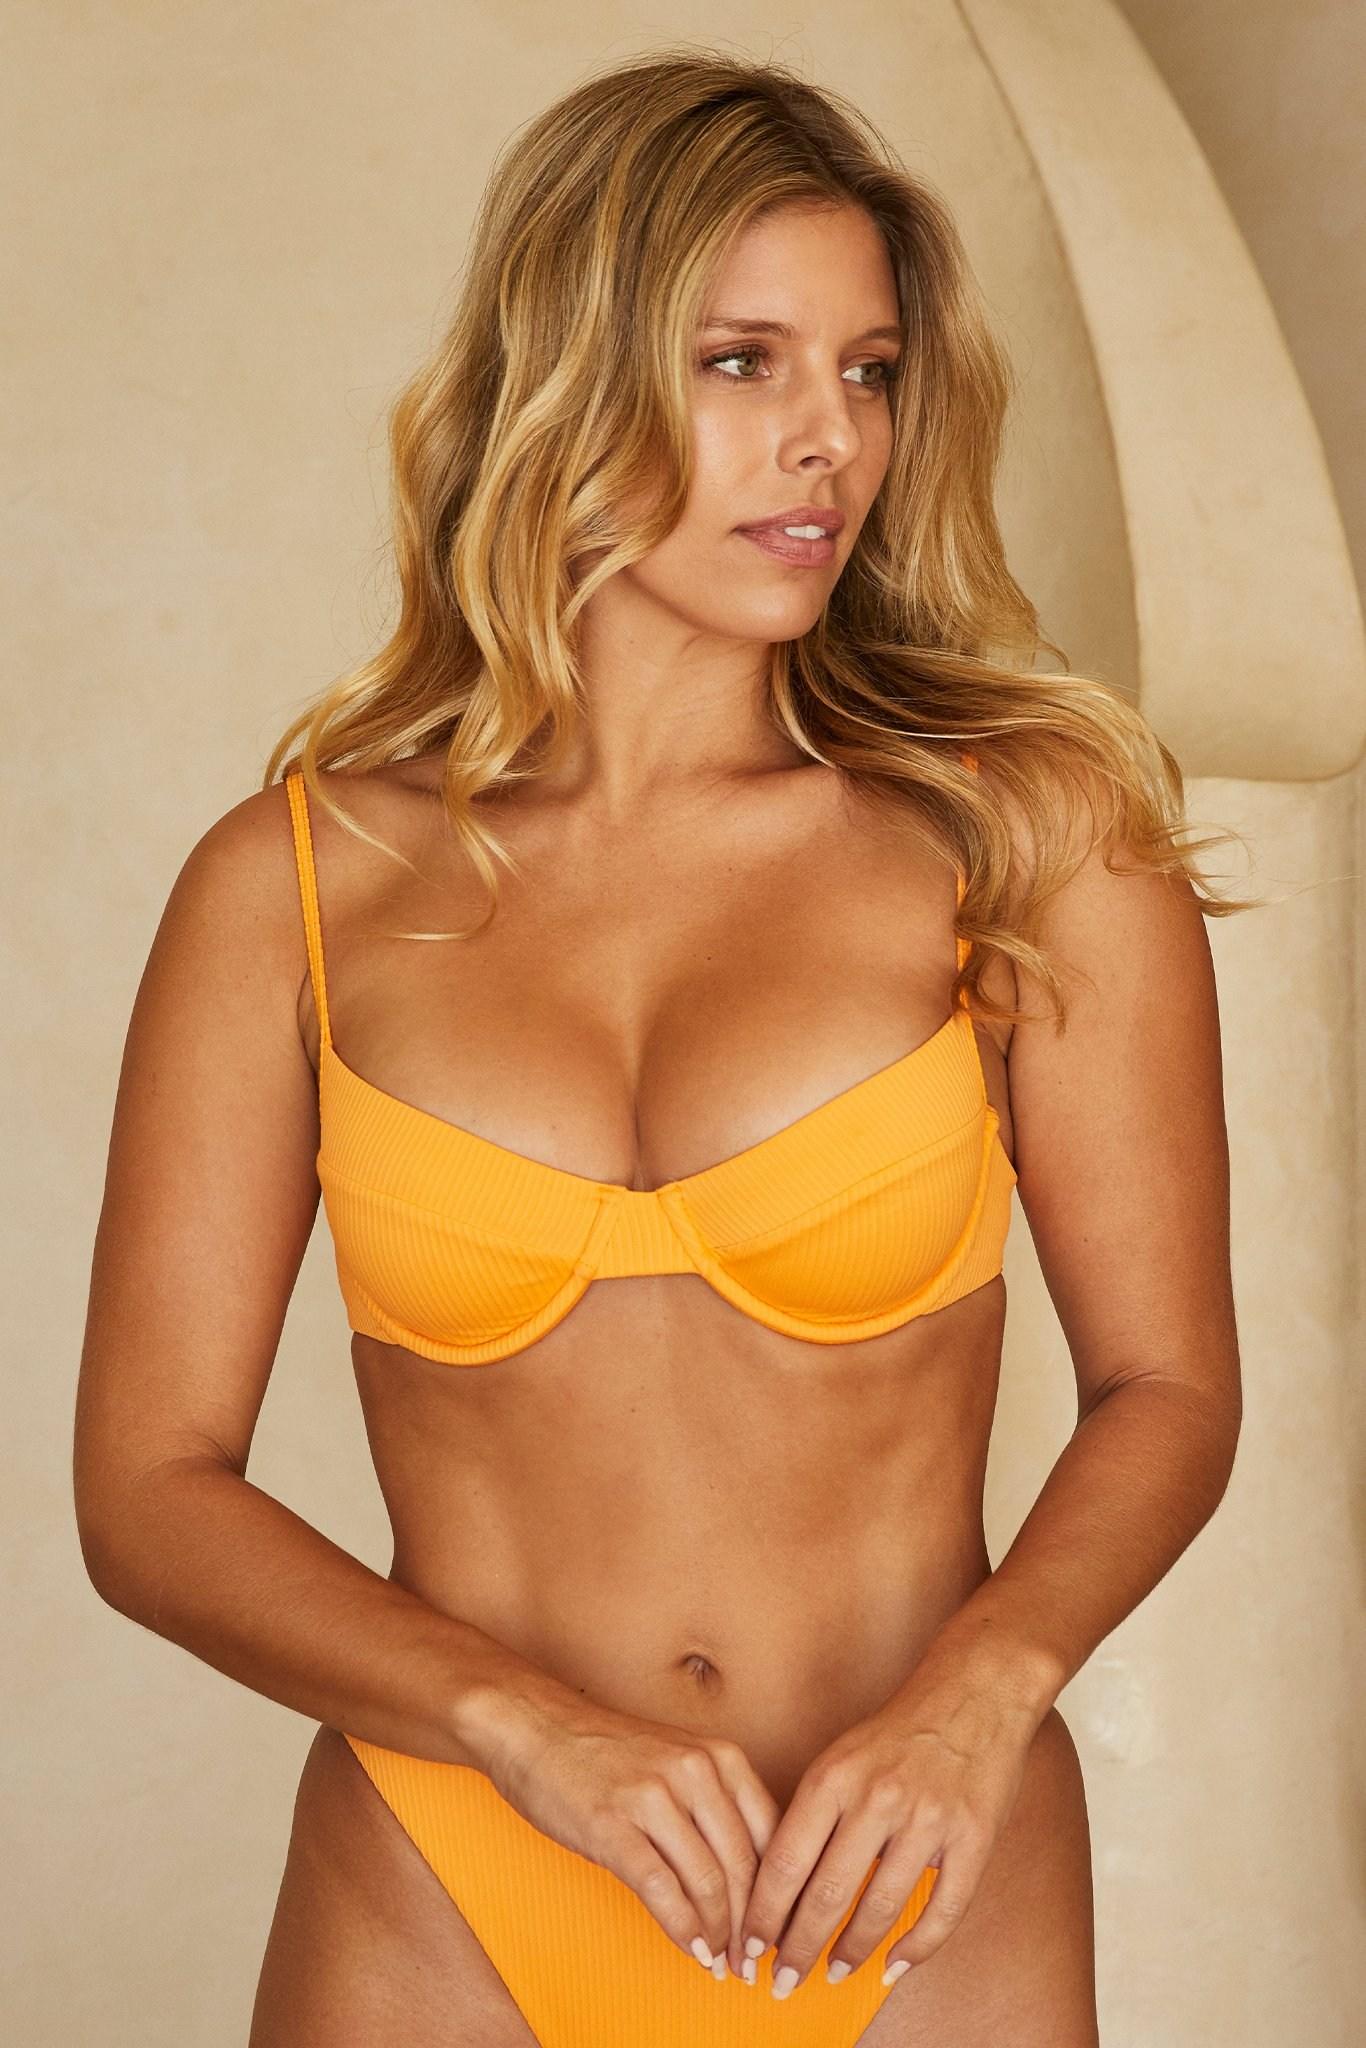 Maui Top by Monday Swimwear, available on mondayswimwear.com for $96 Natasha Oakley Top Exact Product